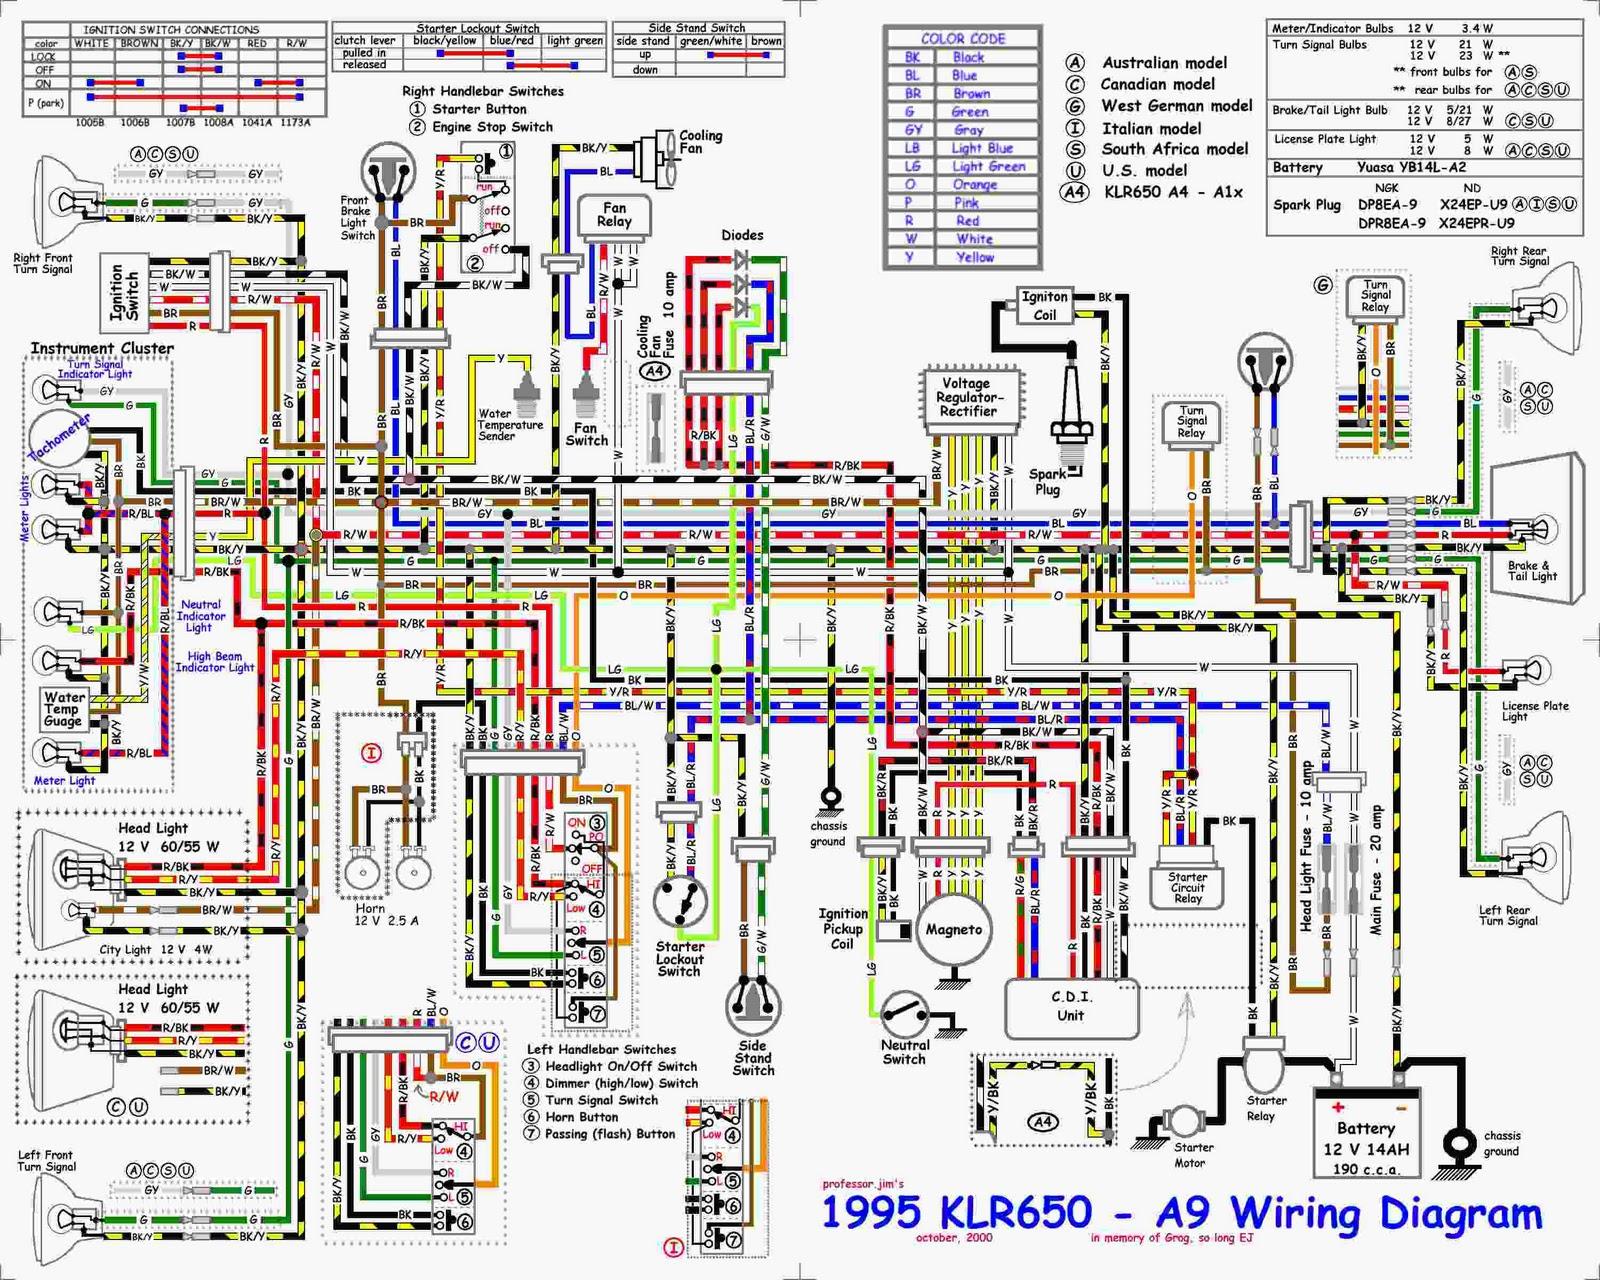 hd_1211] daihatsu transmission diagrams daihatsu circuit diagrams ... daihatsu transmission diagrams automatic transmission linkage getap isra mohammedshrine librar wiring 101